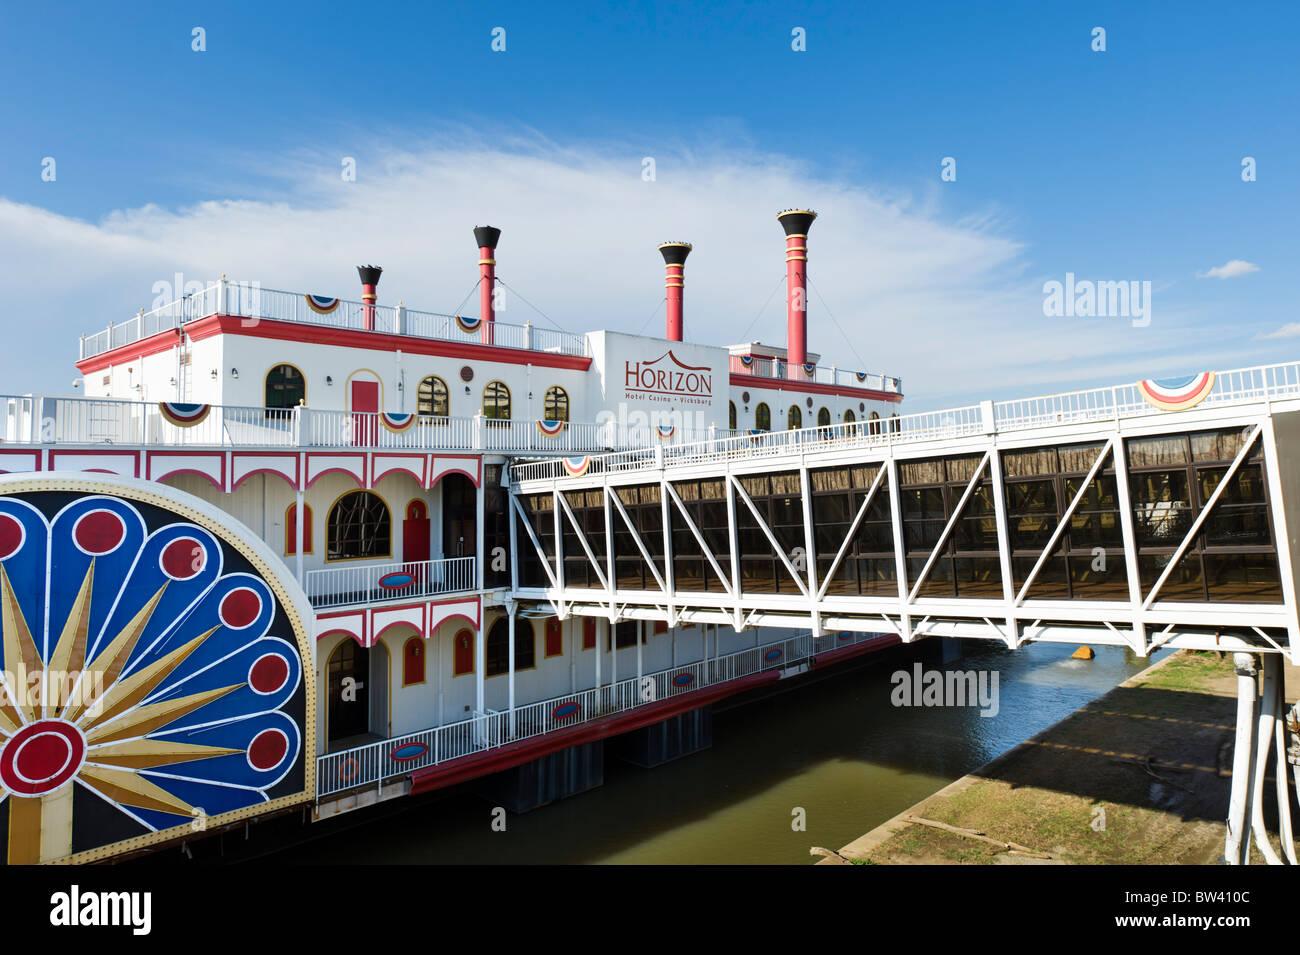 Casino horizon mississippi vicksburg caesars hotel and casino in atlantic city